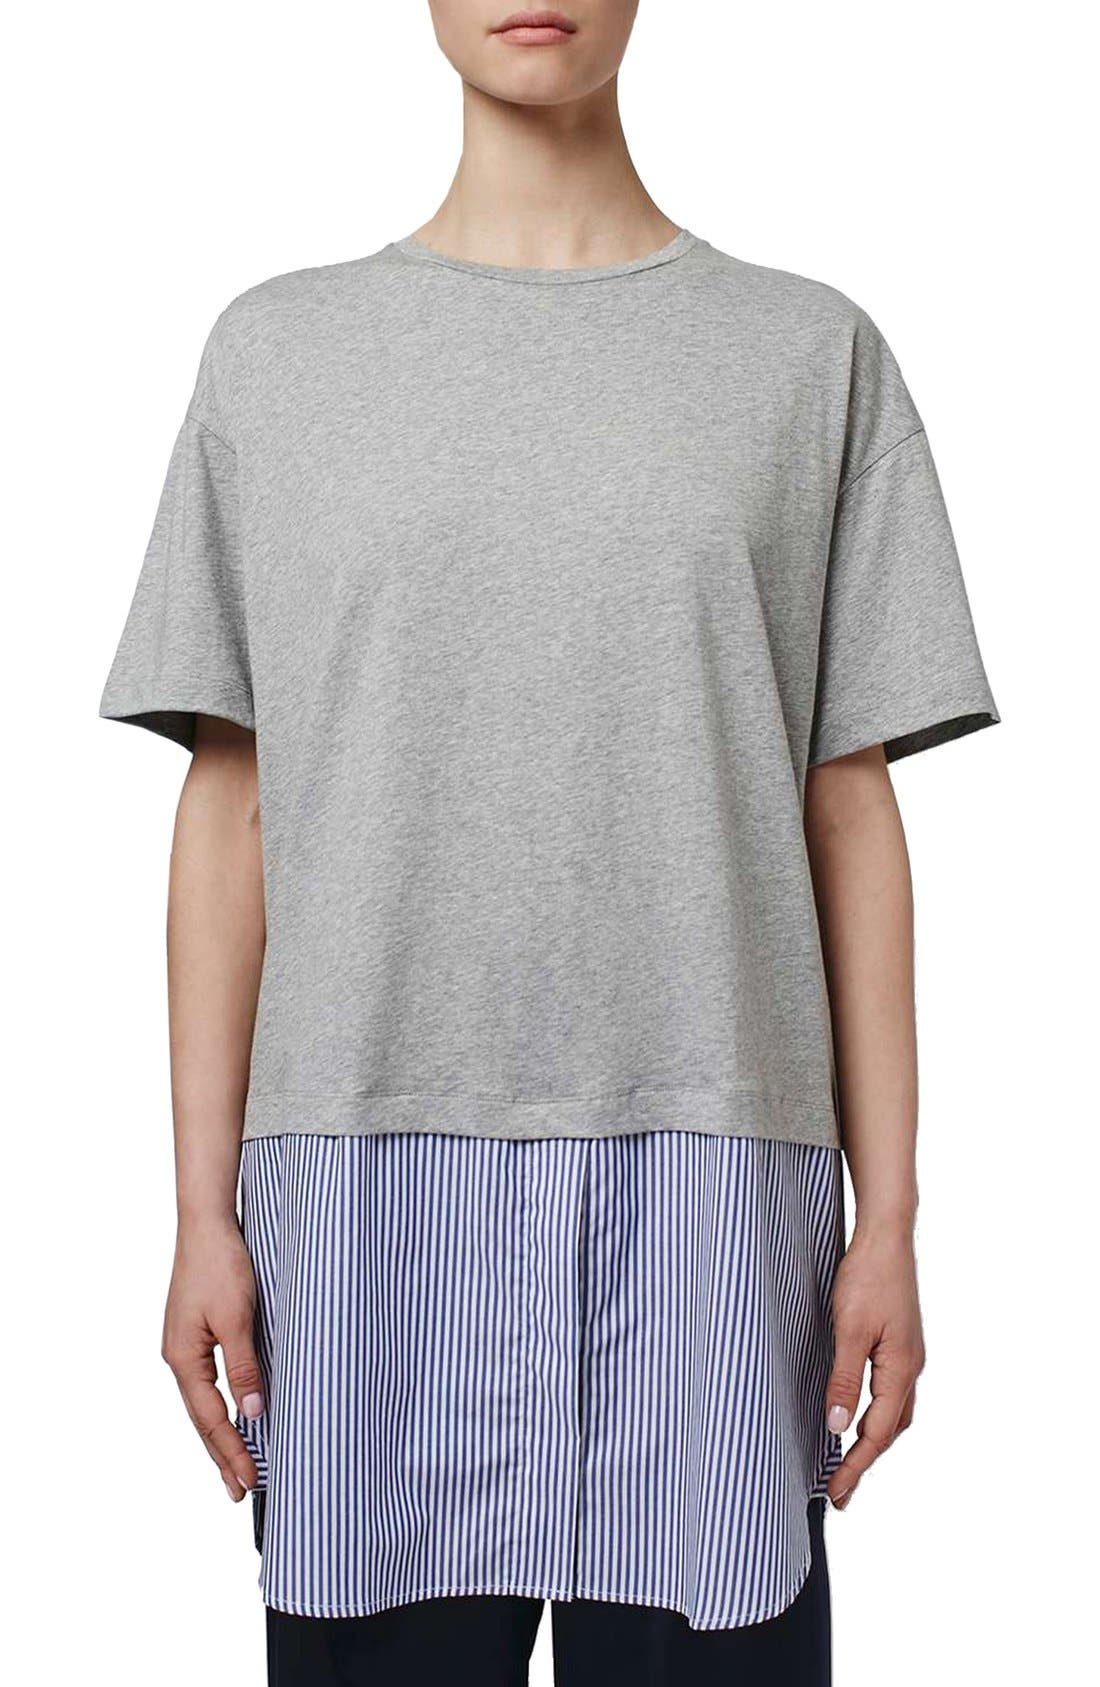 Main Image - Topshop Boutique Stripe Shirt Hem T-Shirt Dress